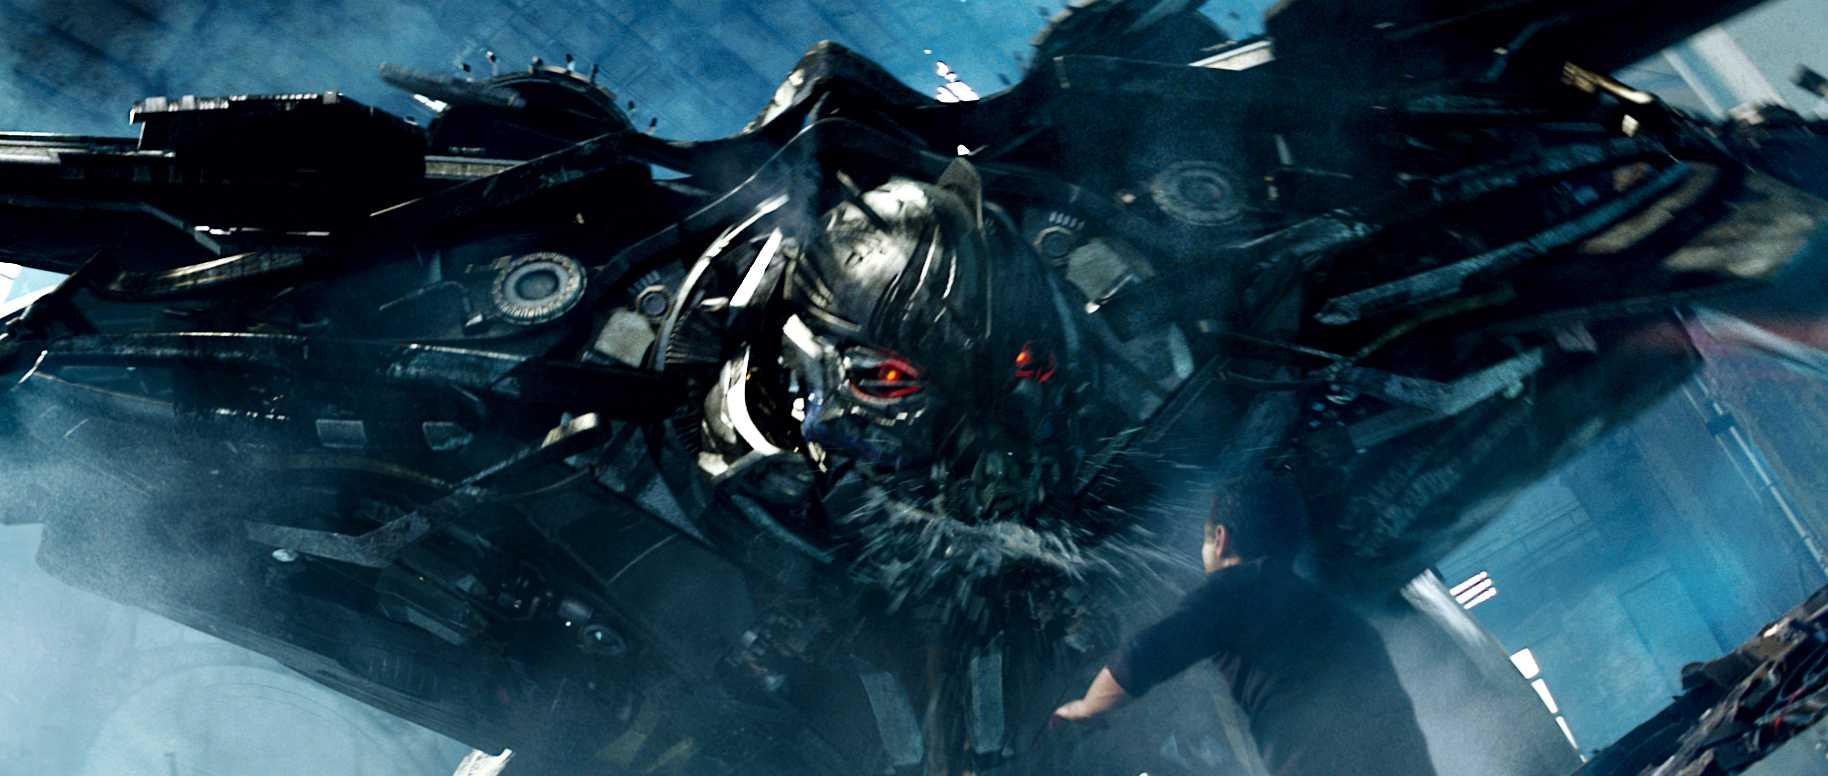 Transformers Revenge of the fallen image - Mod DB